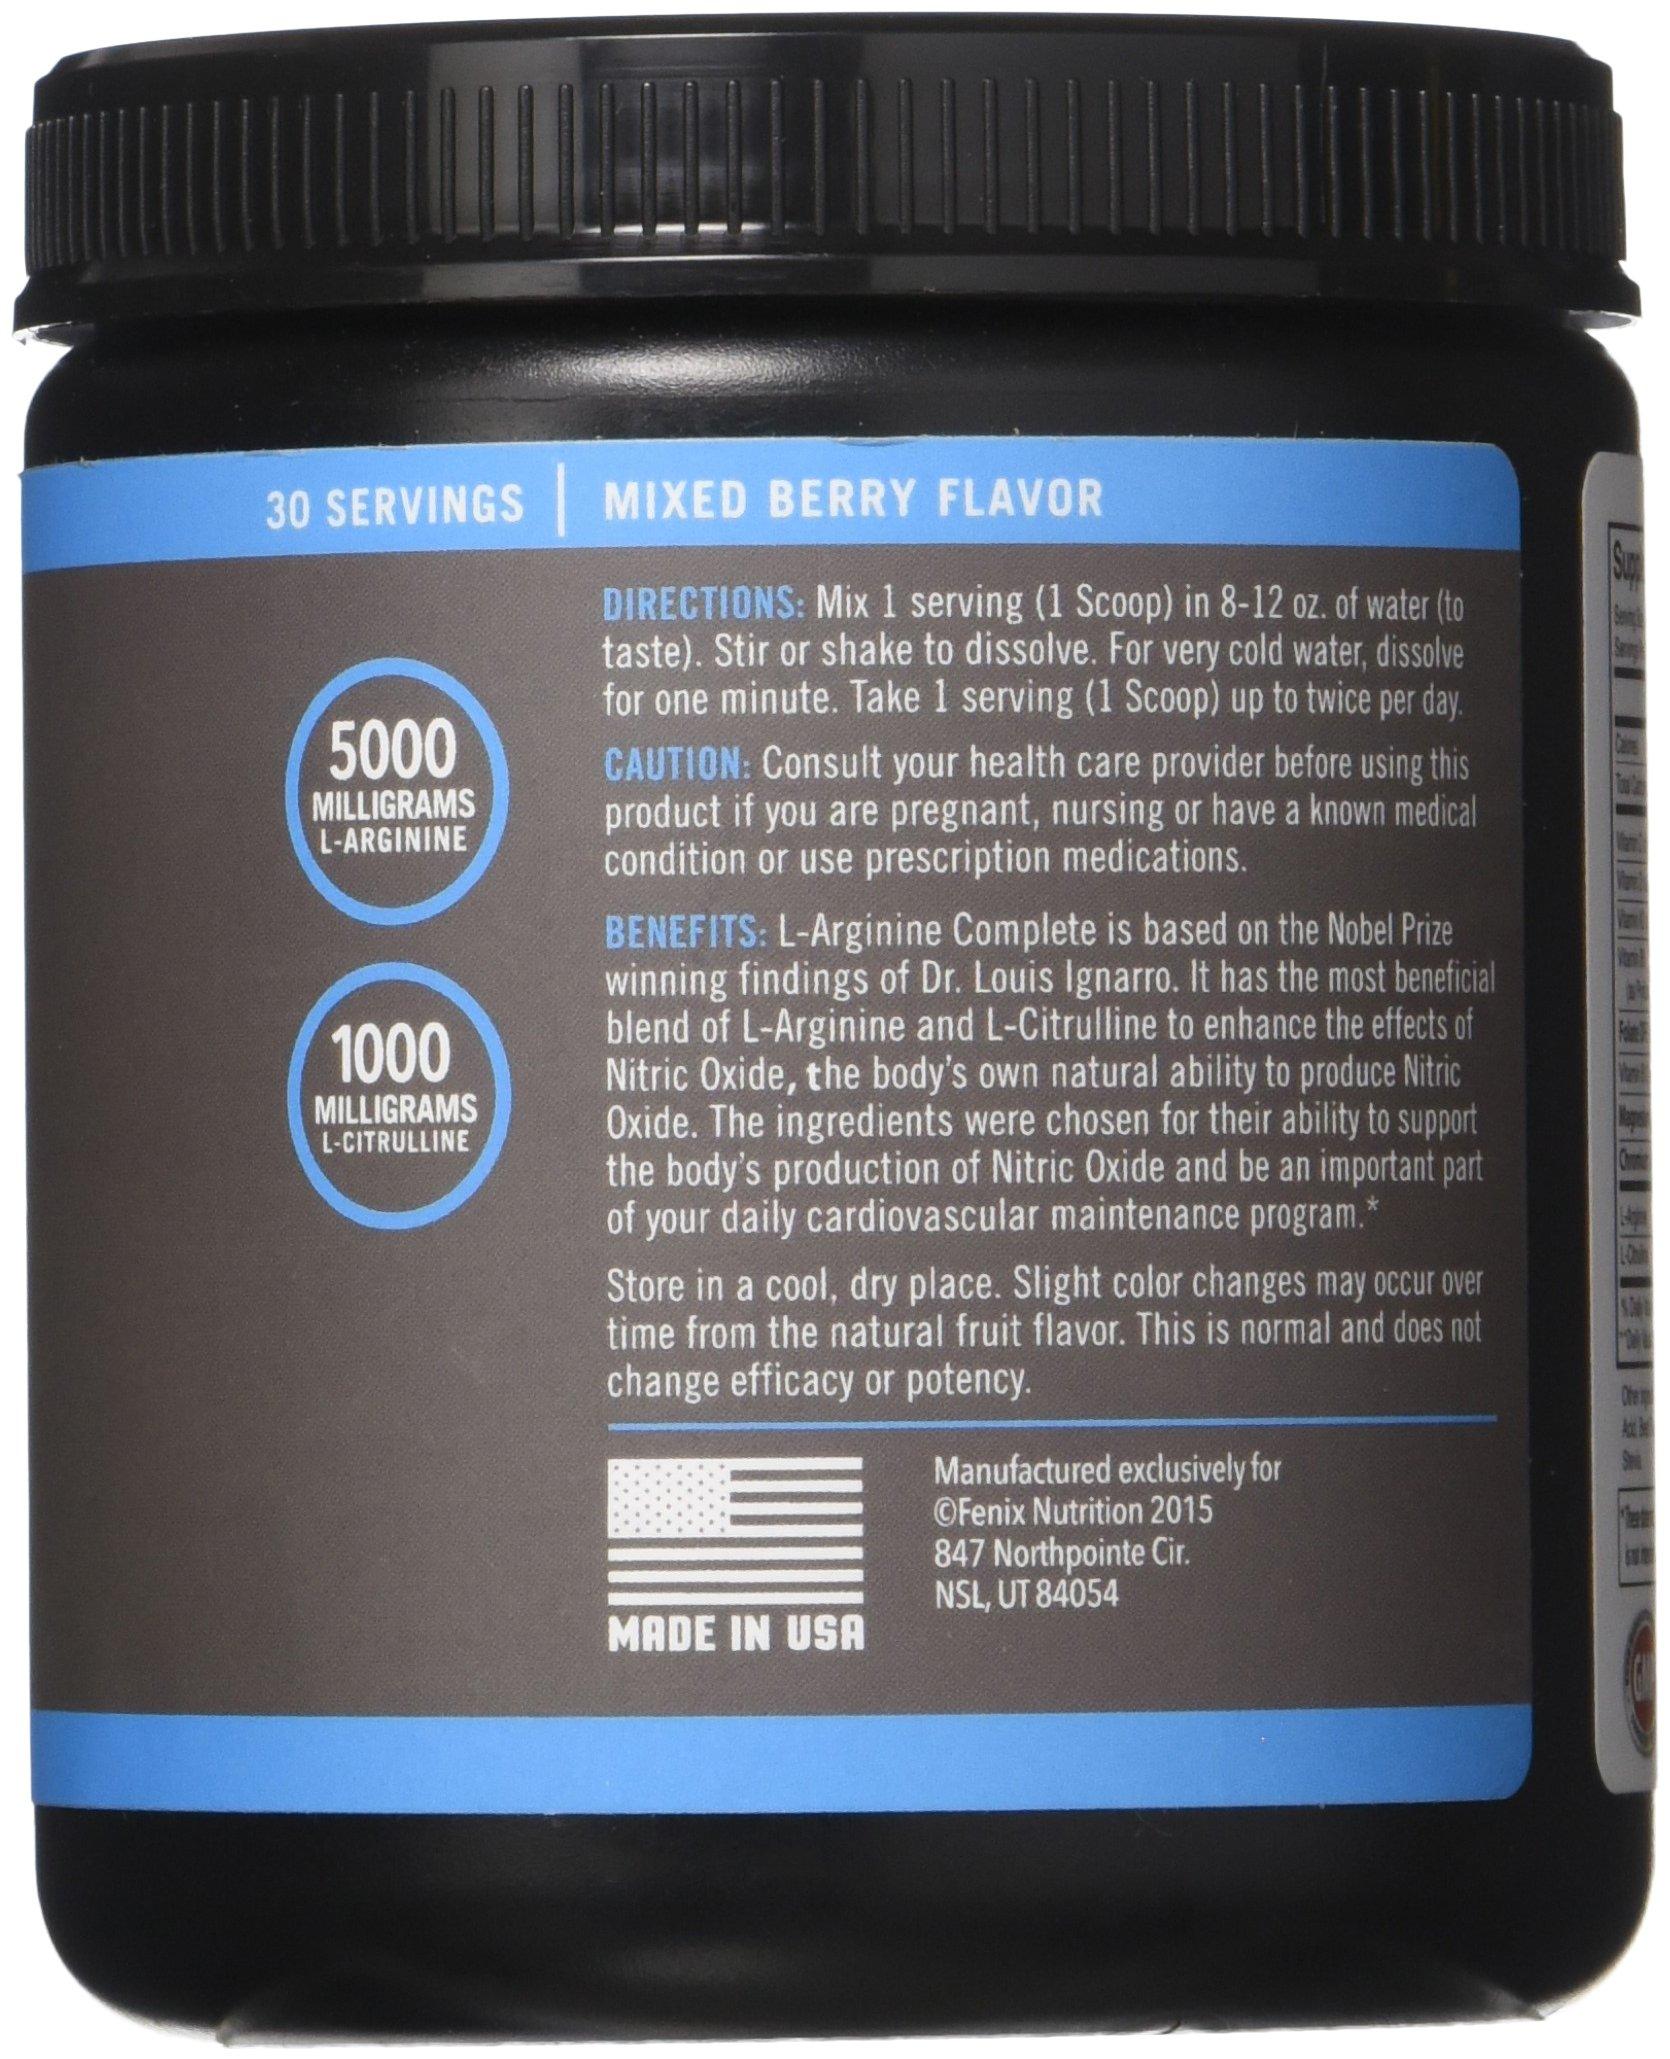 Fenix Nutrition - FNX L-Arginine Complete - Cardio Health Formula - Contains L-Citrulline - Enhance Effects Of Nitric Oxide - Secret Weapon For Libido - Mixed Berry - 3 Jars by Fenix Nutrition (Image #4)